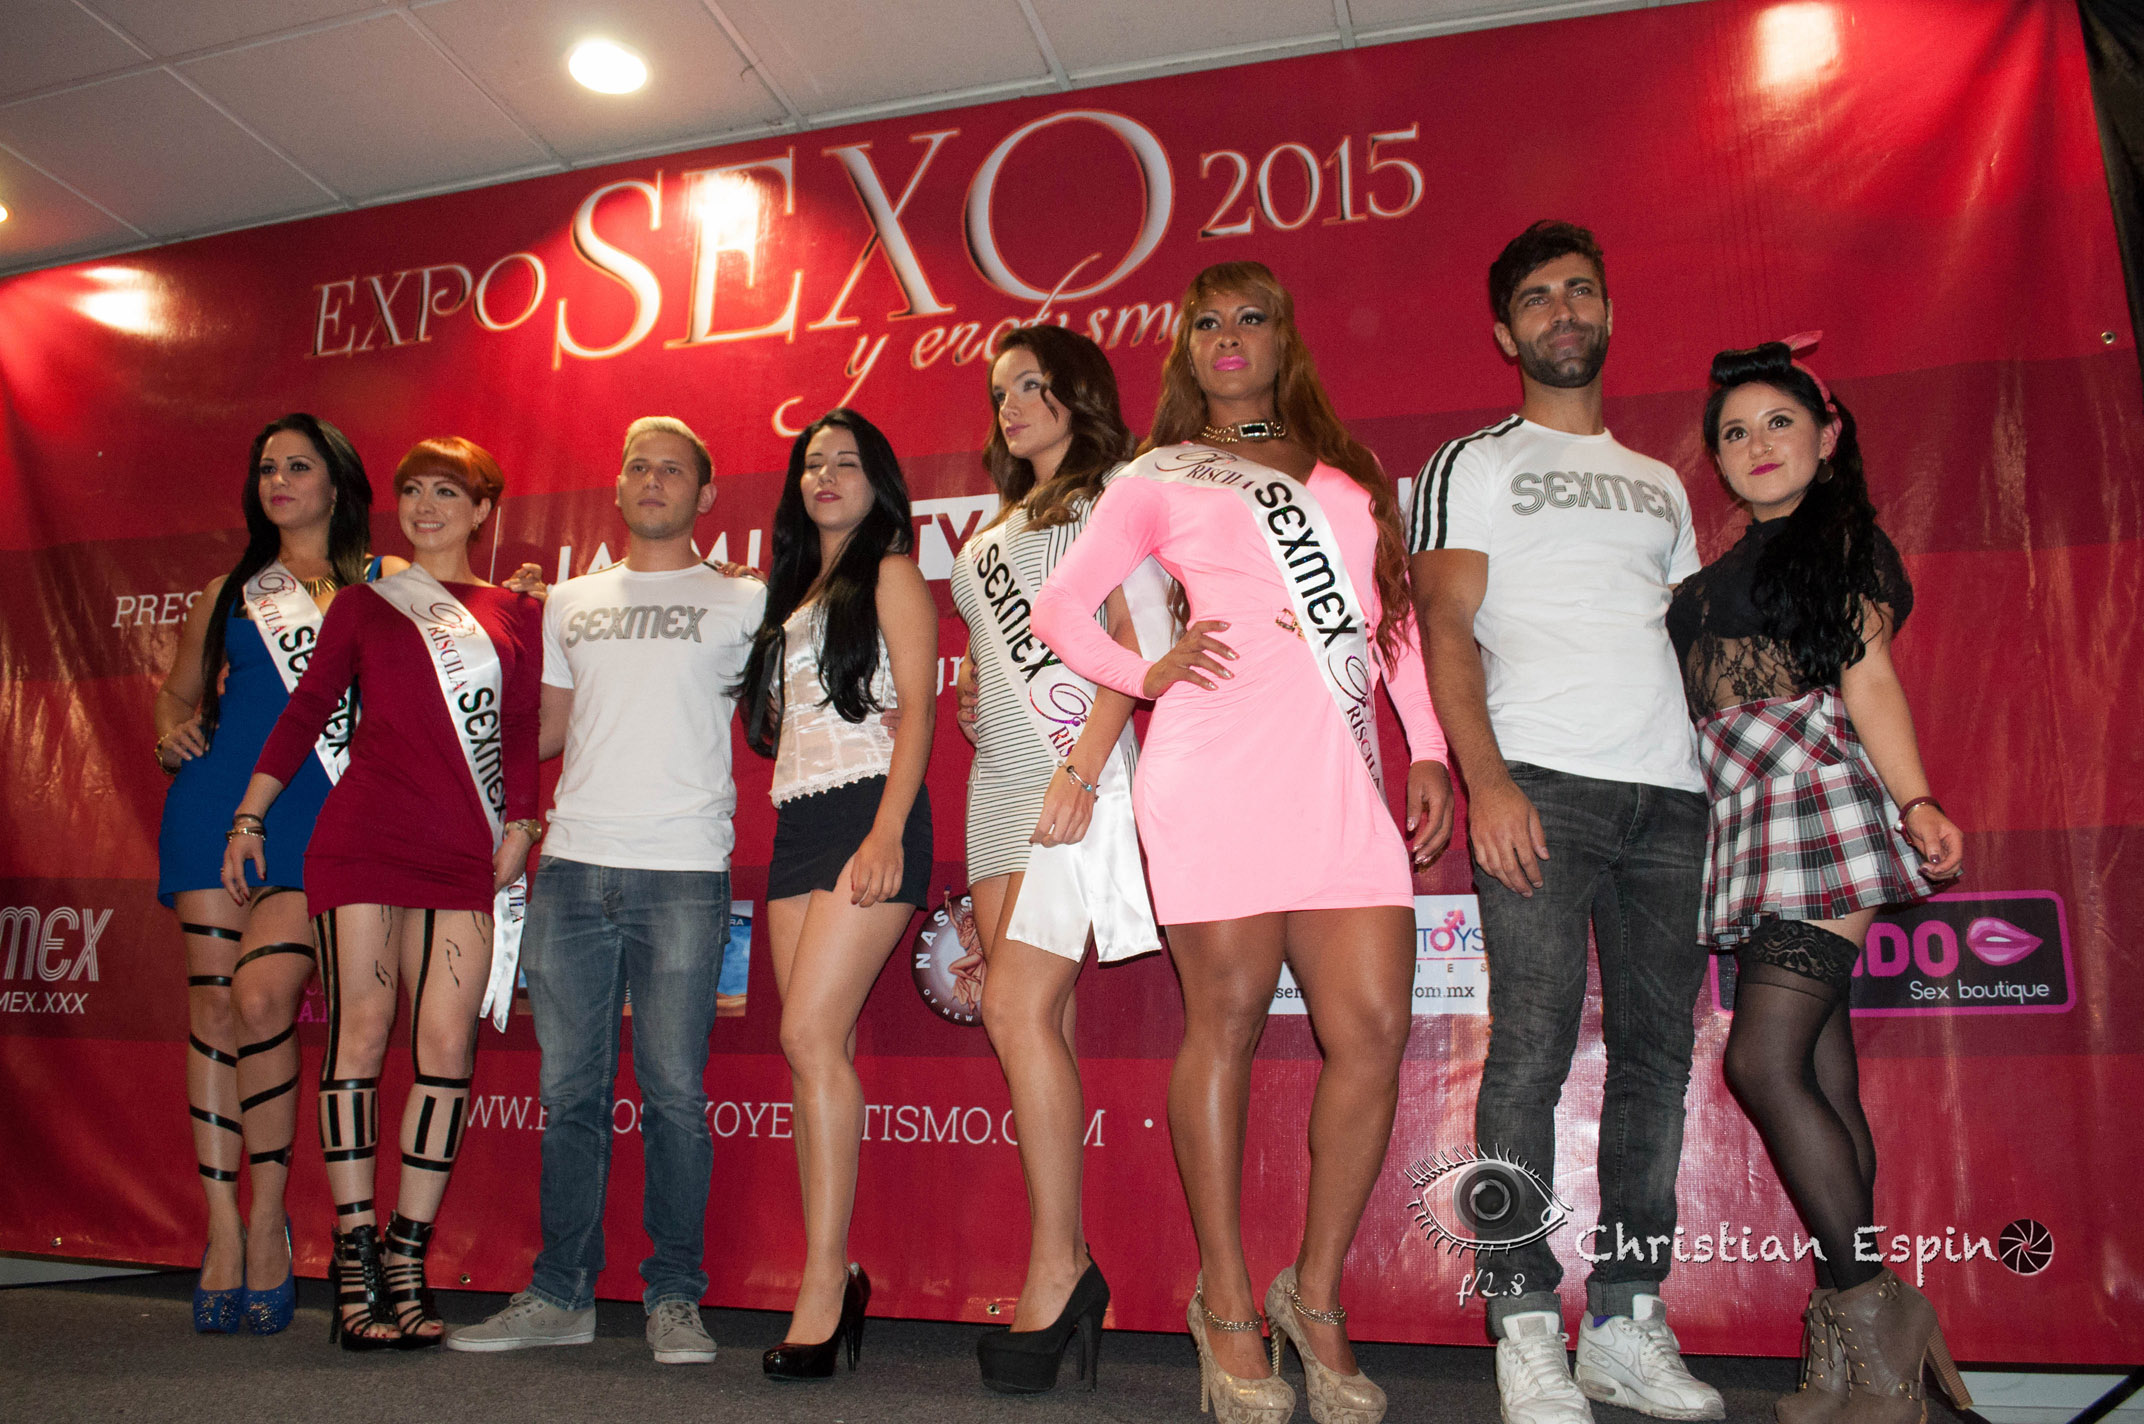 ExpoSexo-1